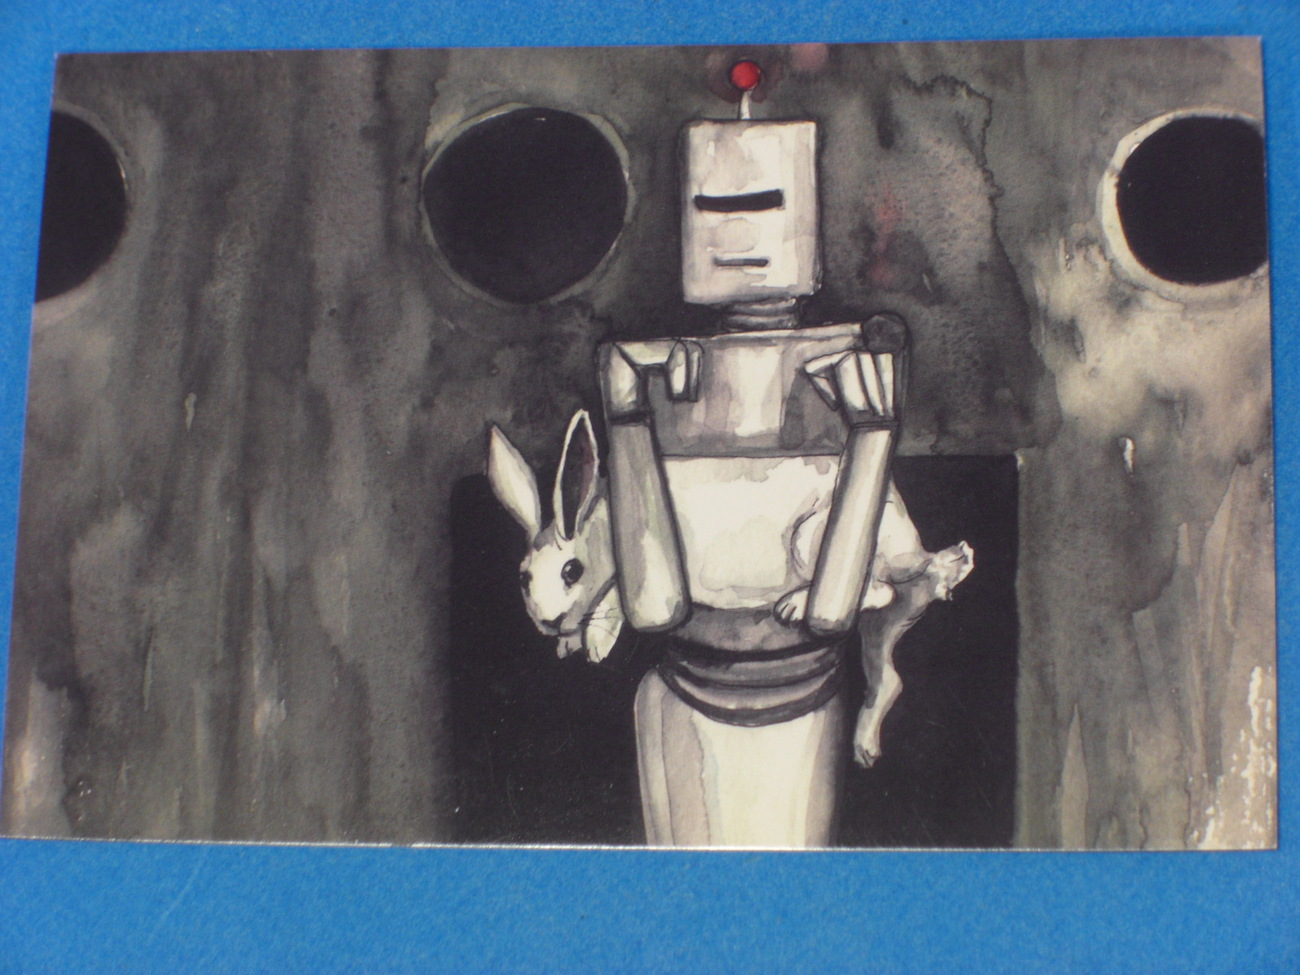 Android & Little White Rabbit Postcard Nakisha VanderHoeven